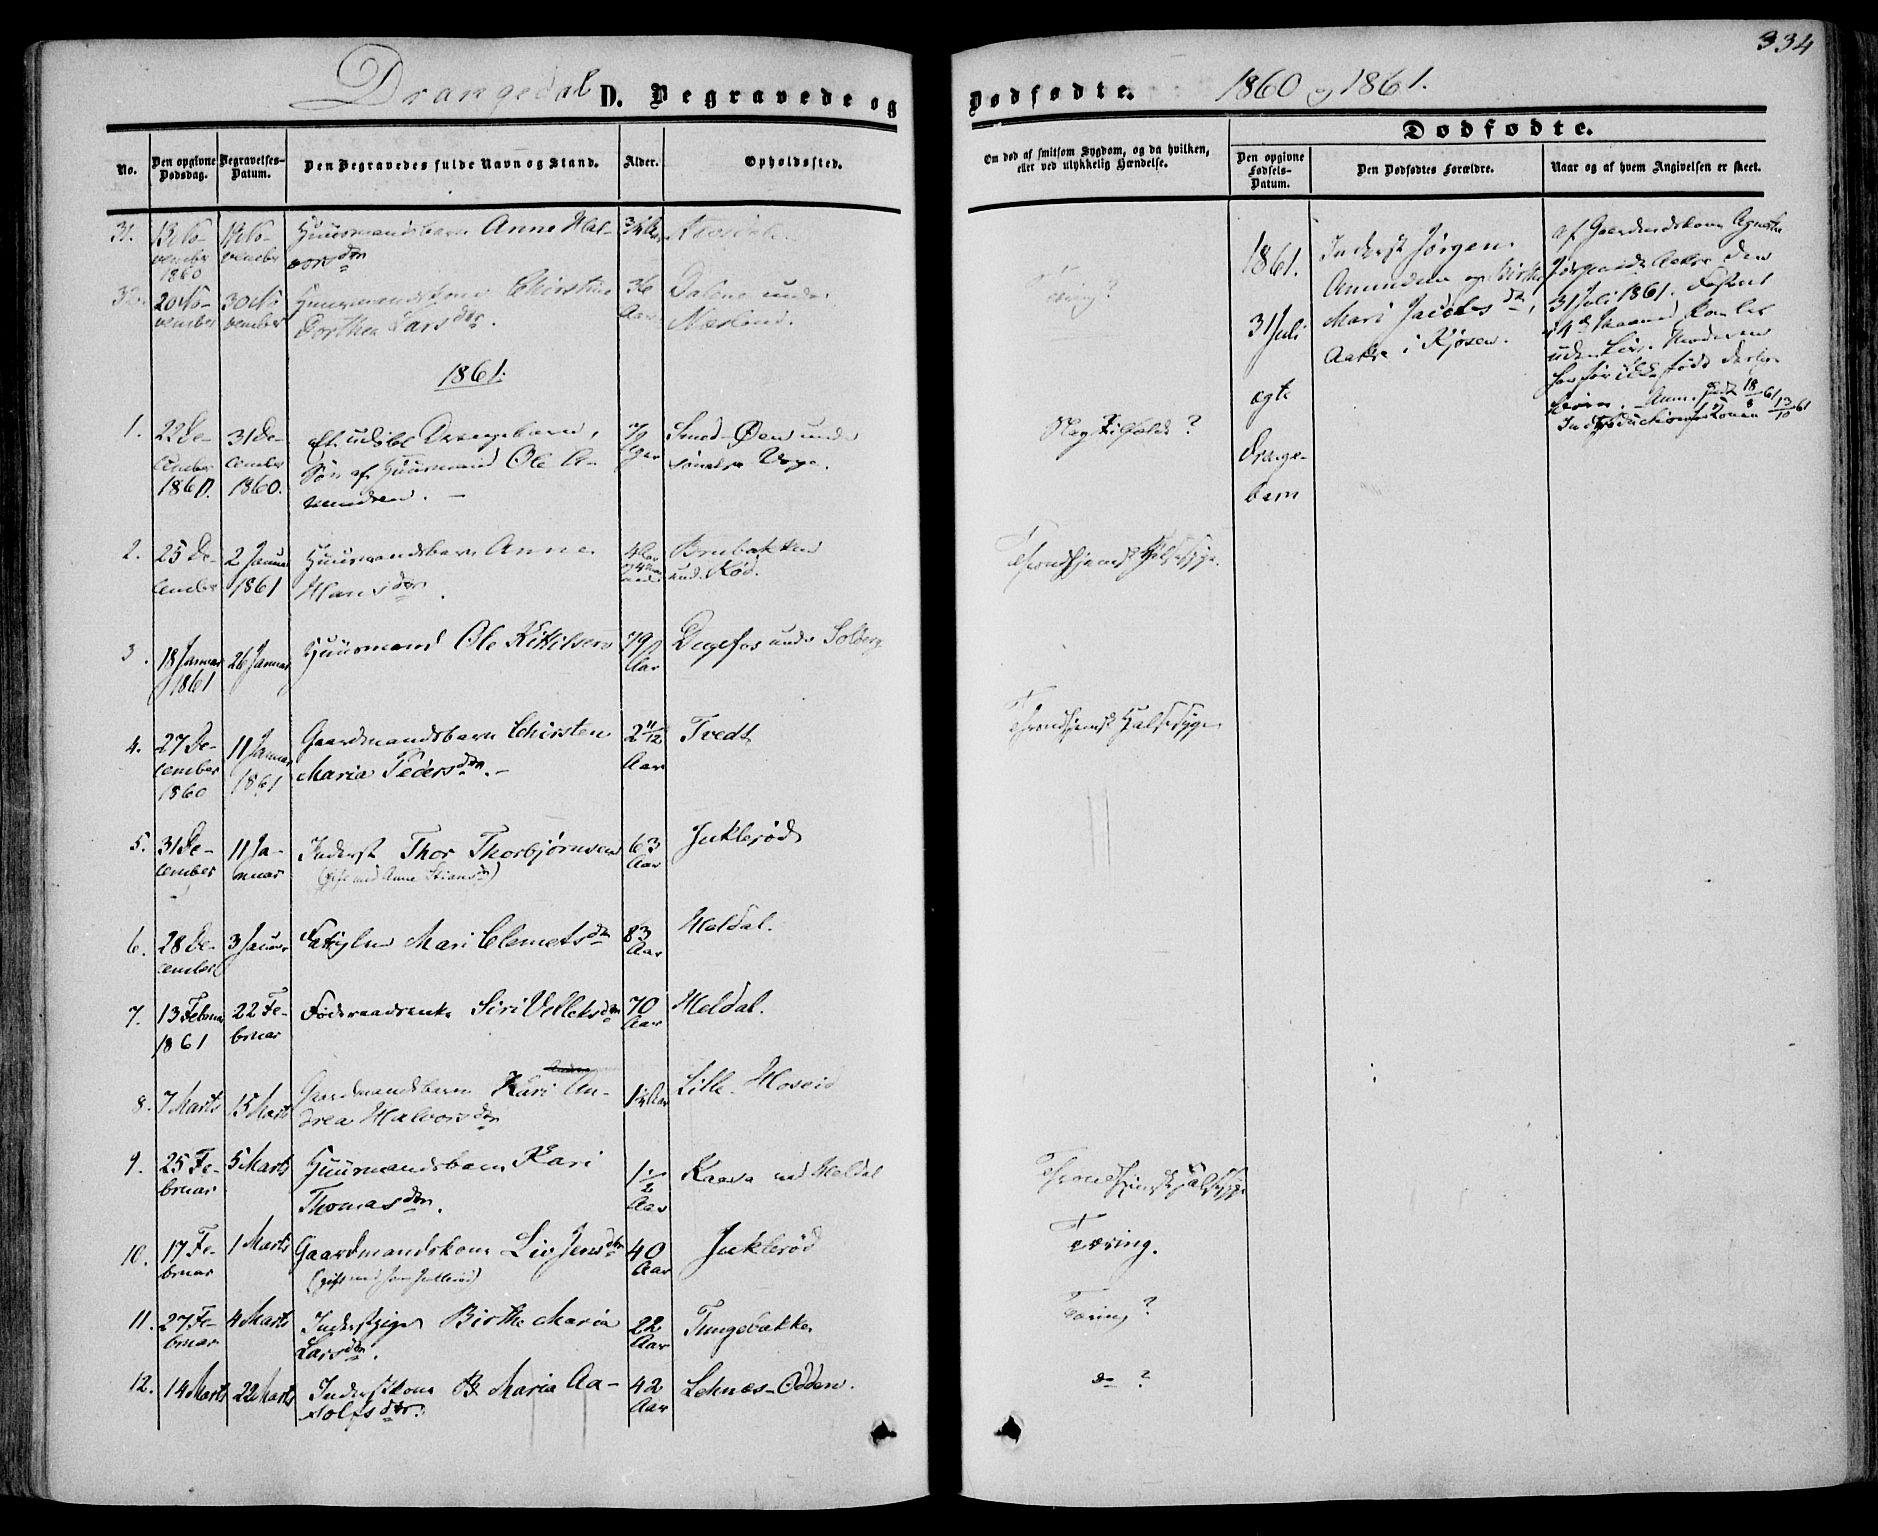 SAKO, Drangedal kirkebøker, F/Fa/L0008: Ministerialbok nr. 8, 1857-1871, s. 334